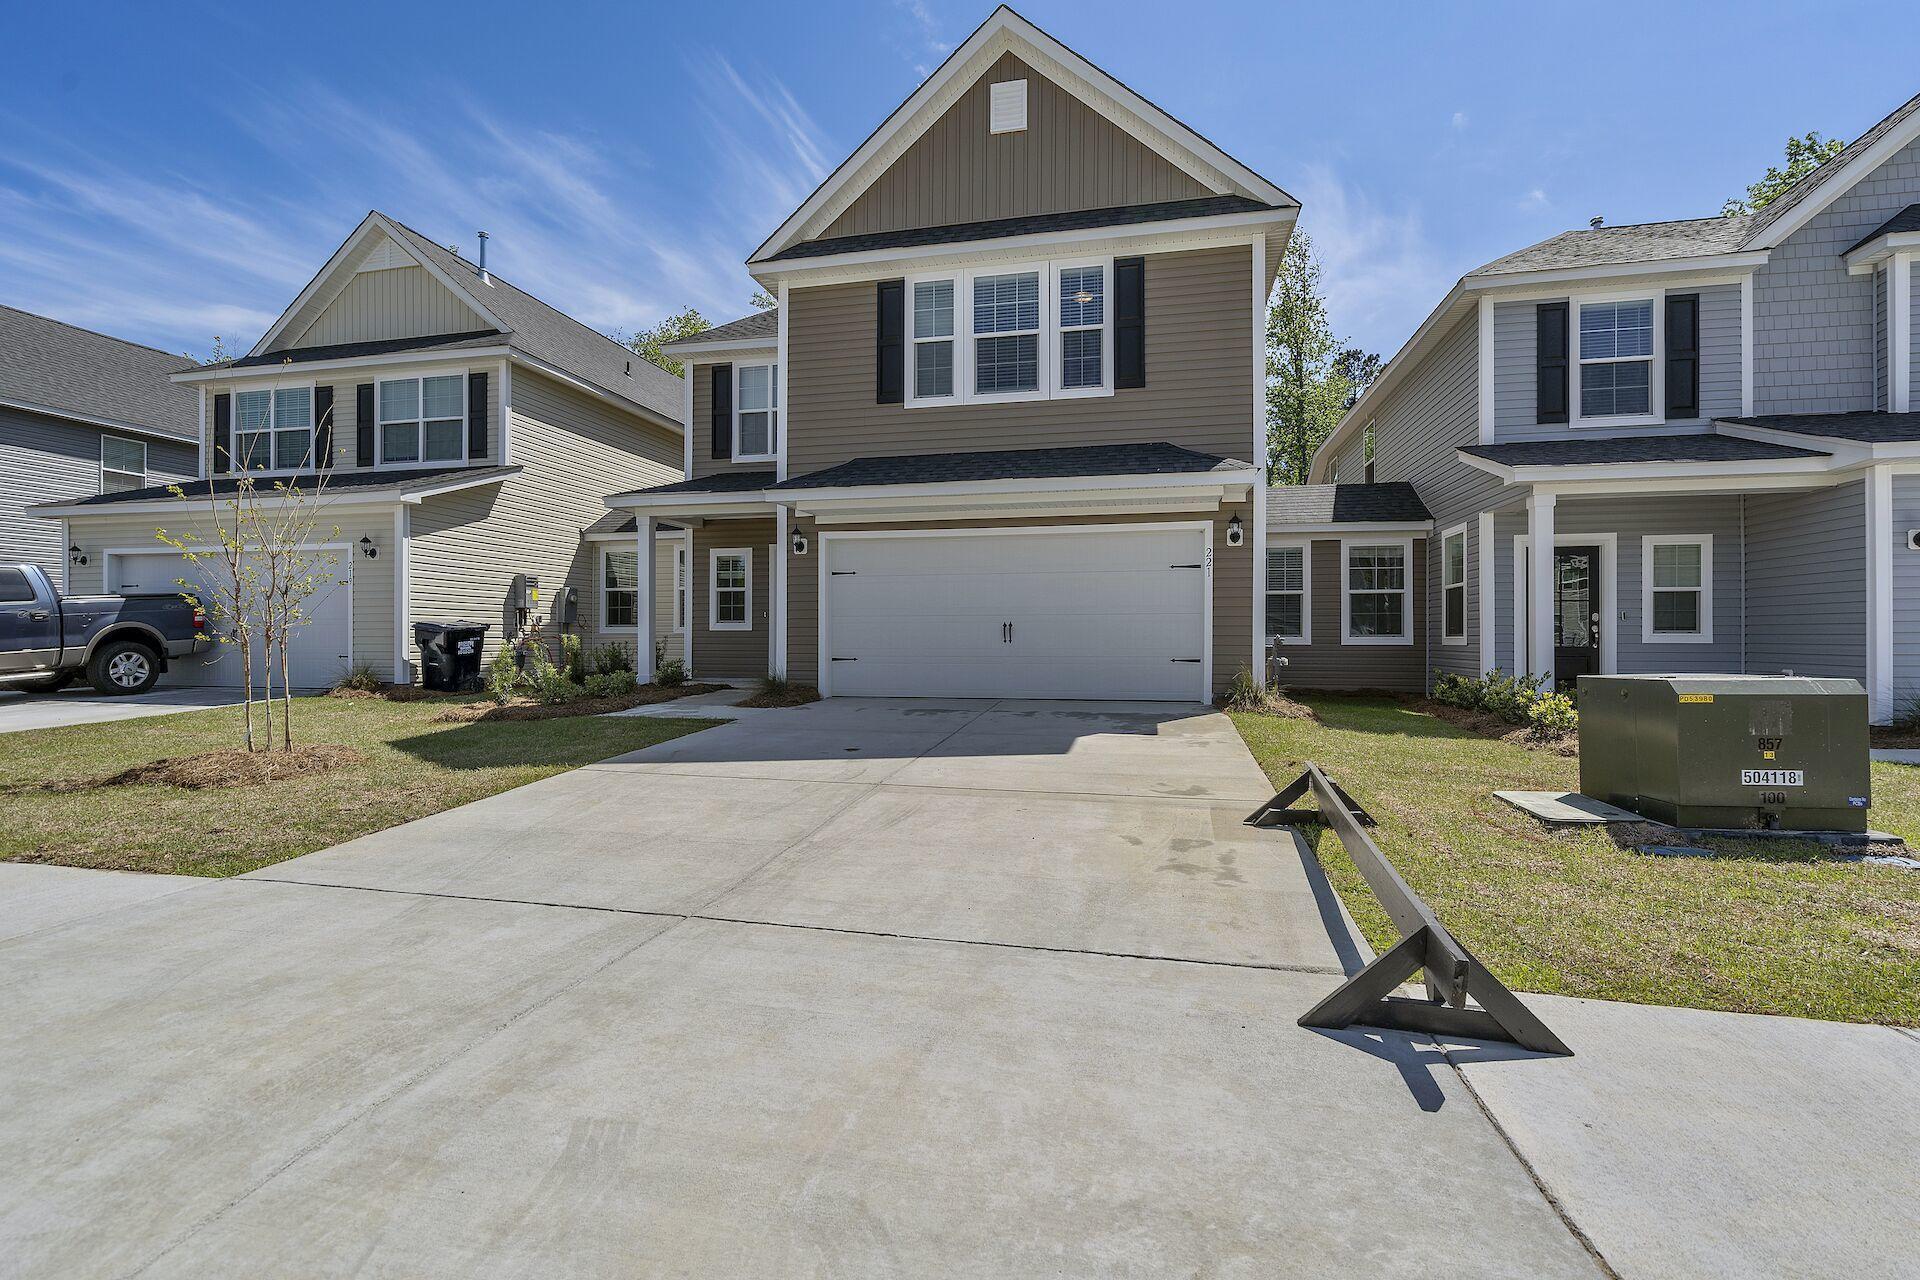 Hampton Woods Homes For Sale - 5 Mcclellan, Summerville, SC - 11